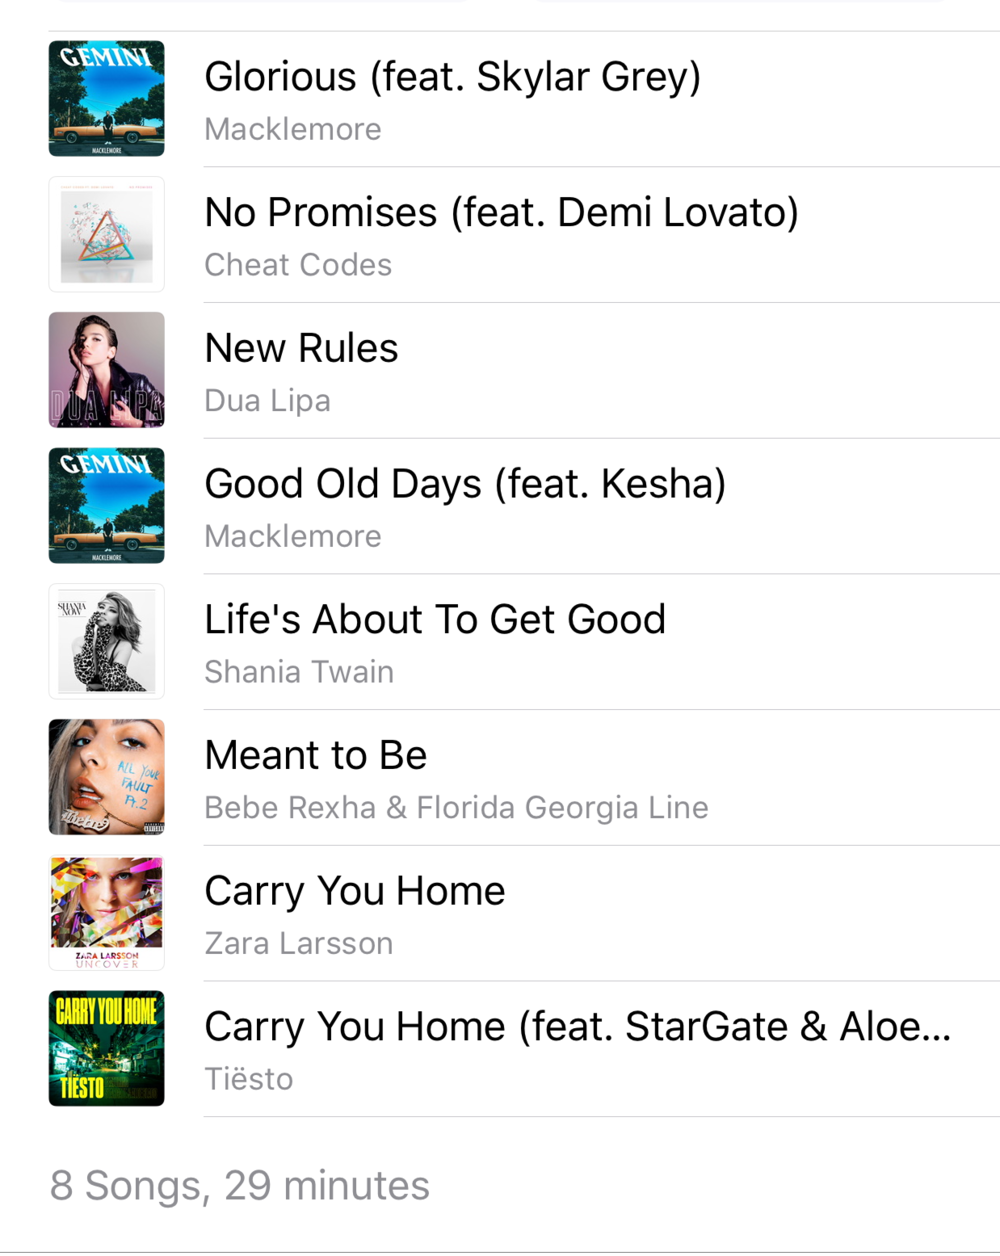 iTunes fitness playlist